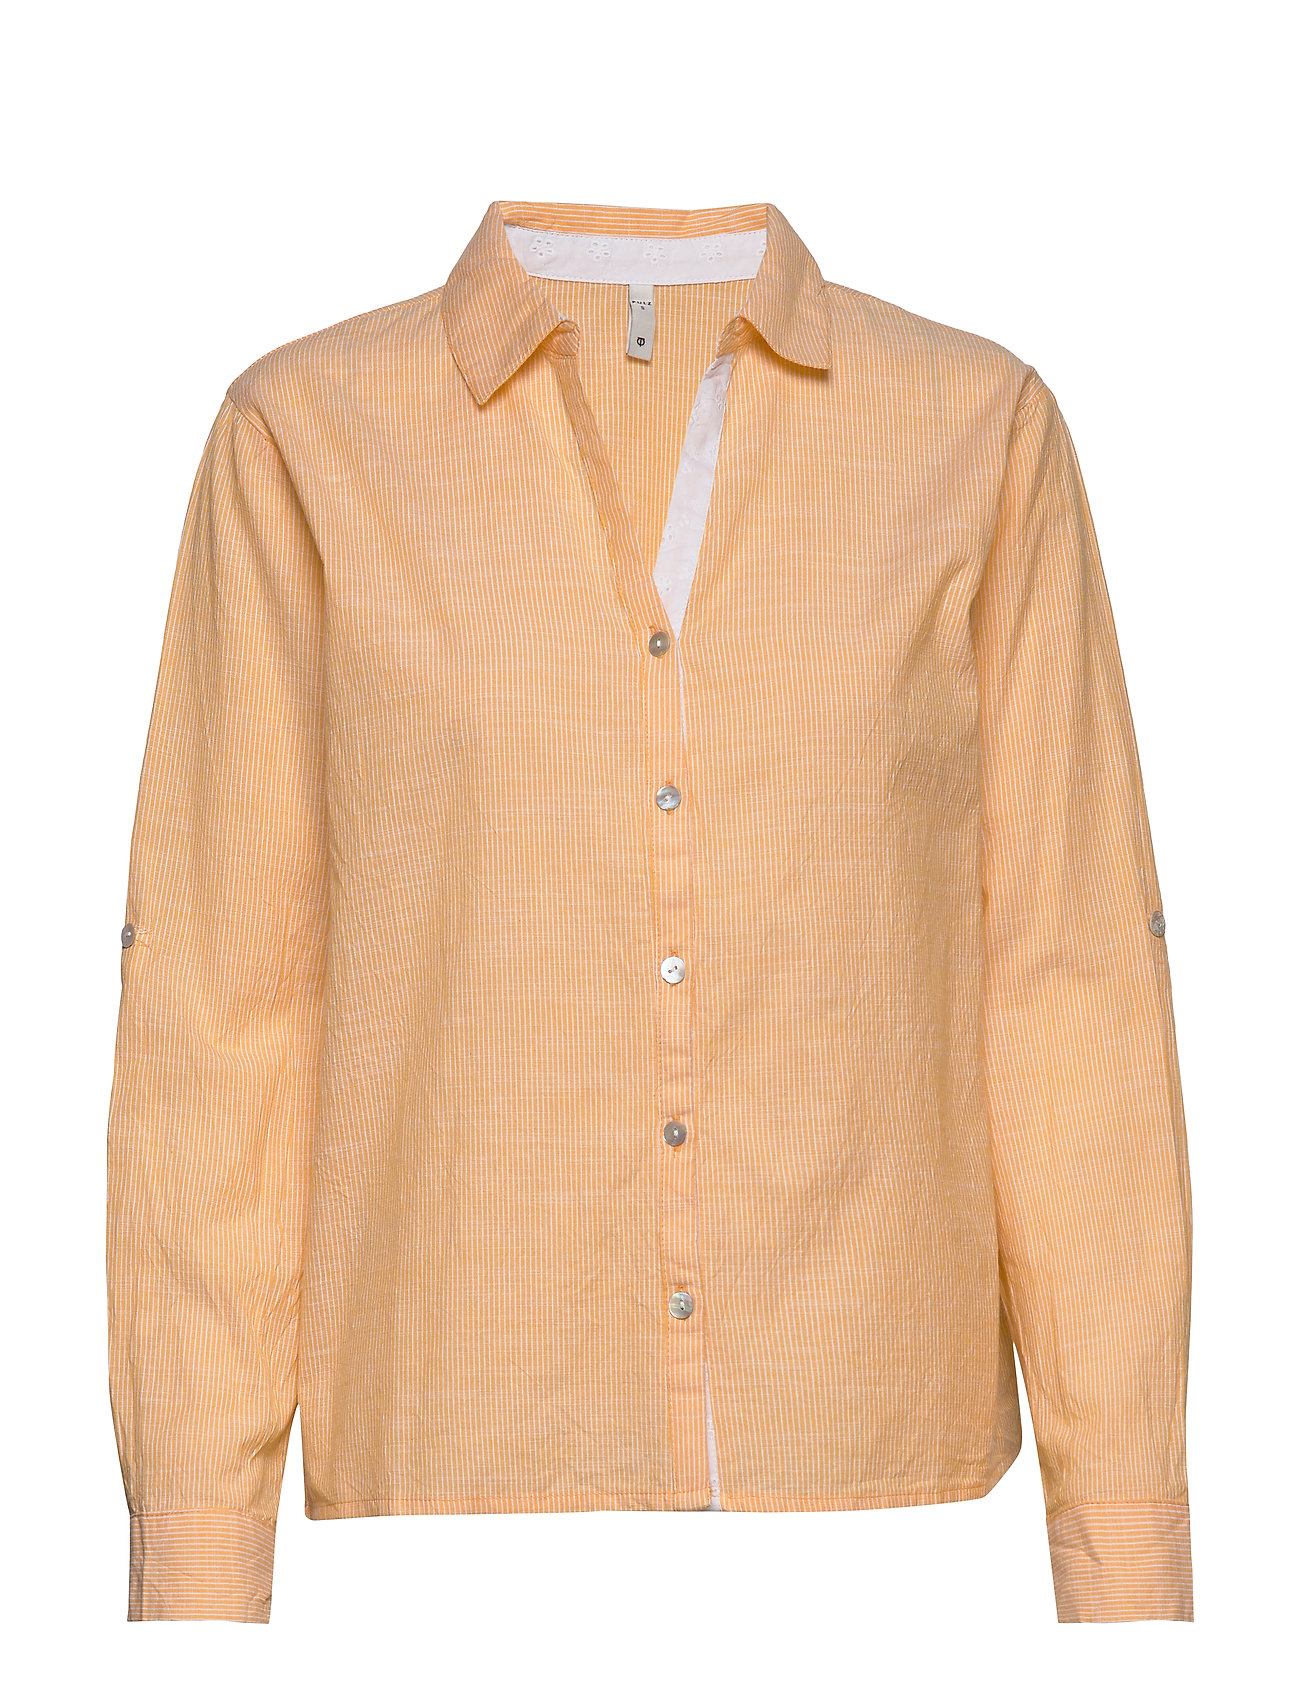 Image of Pzl Shirt Langærmet Skjorte Gul Pulz Jeans (3363496213)